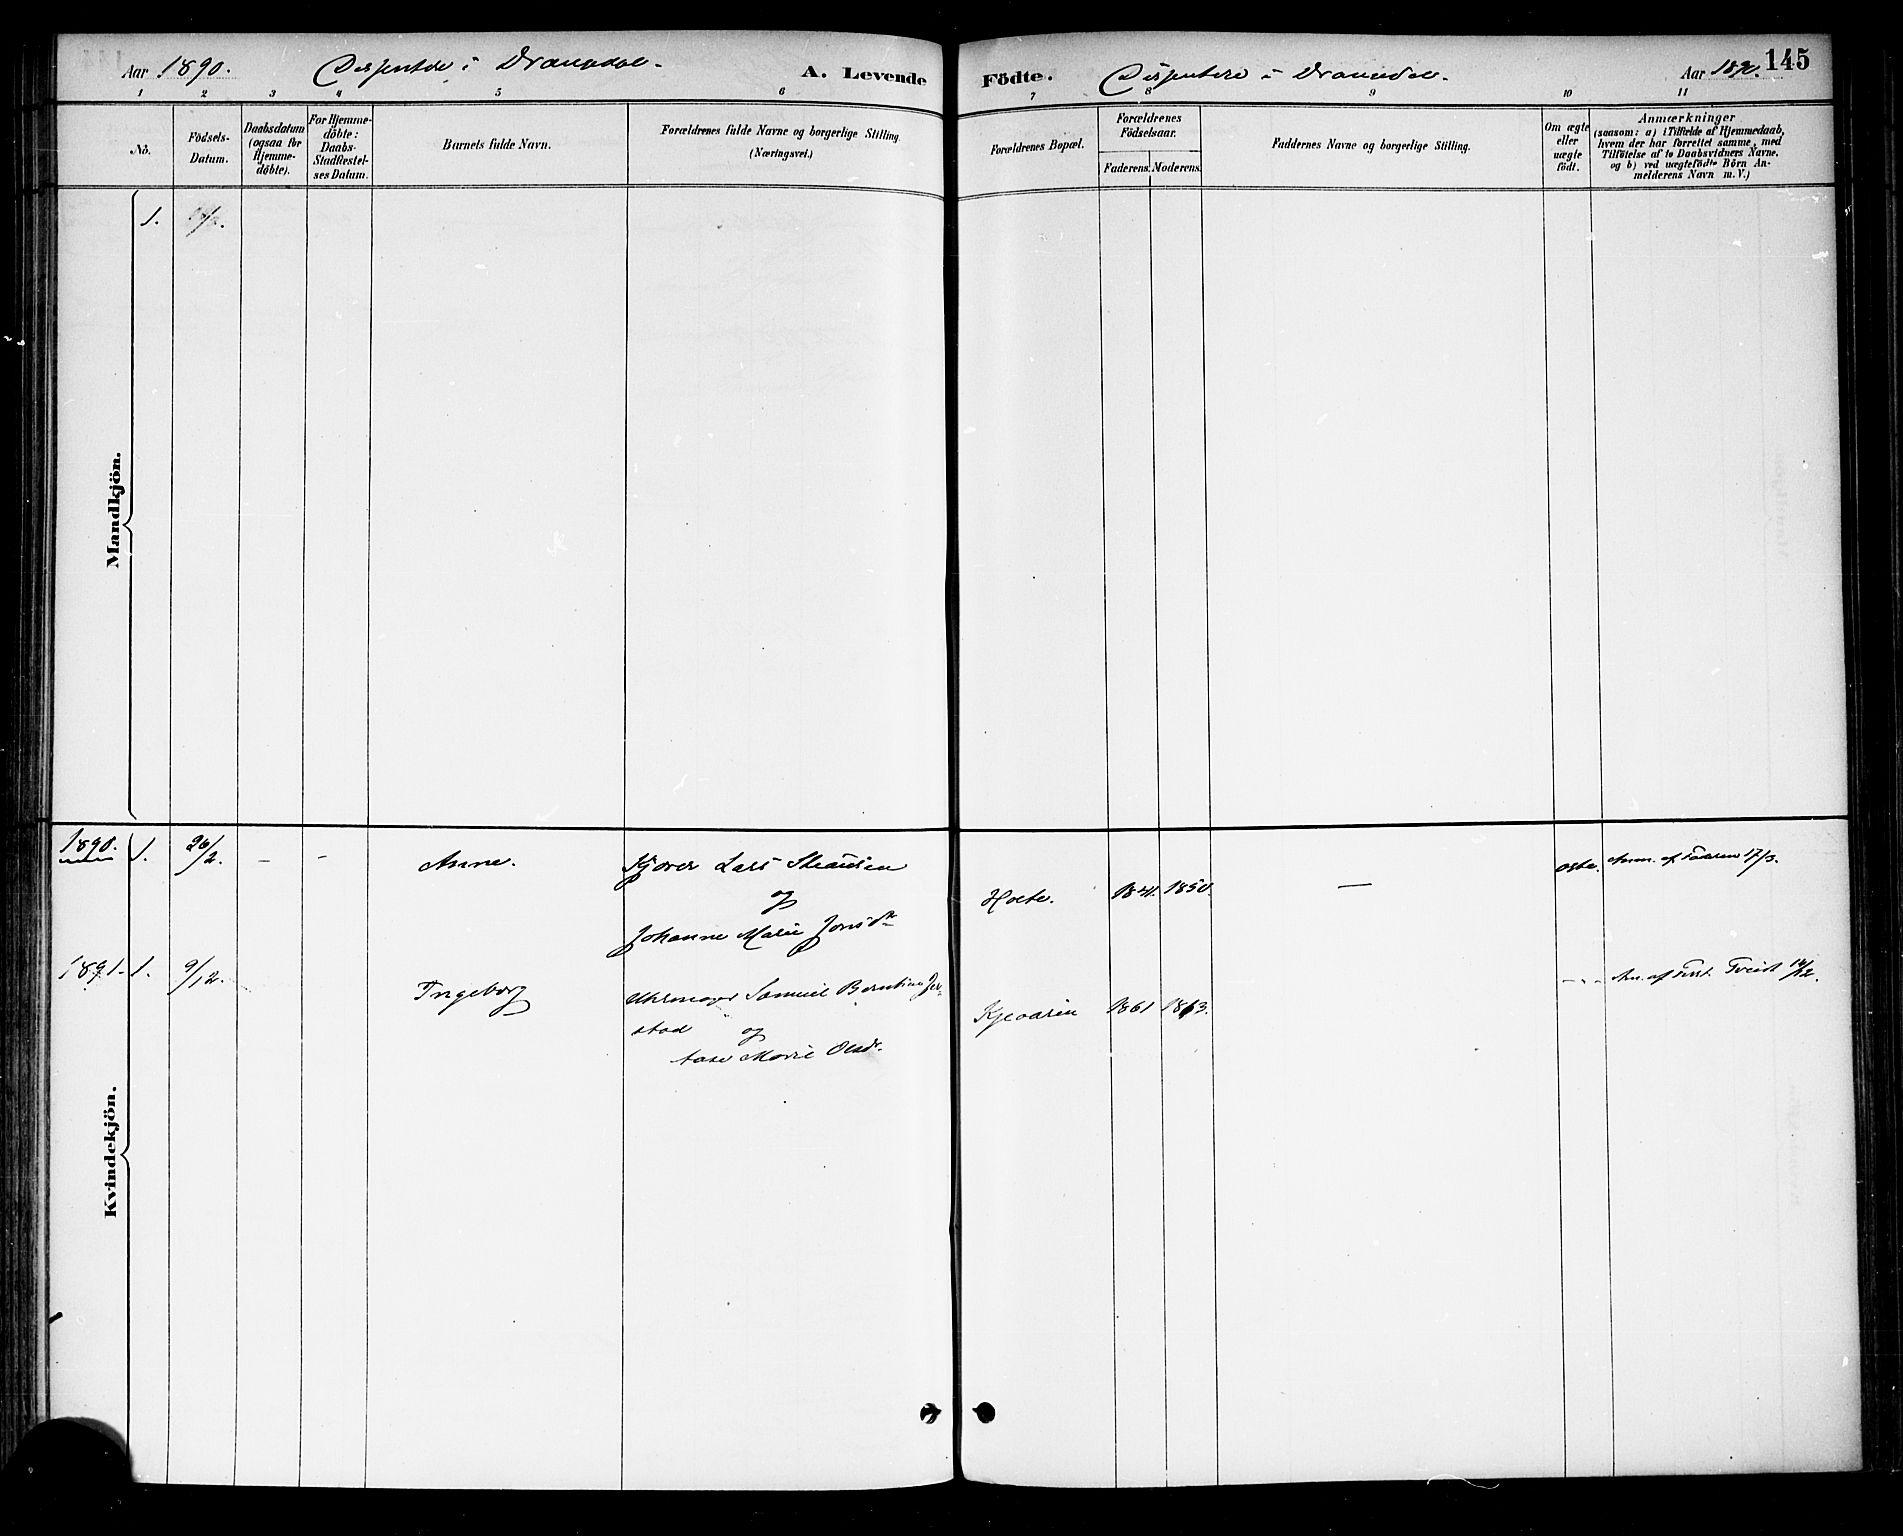 SAKO, Drangedal kirkebøker, F/Fa/L0010: Ministerialbok nr. 10 /1, 1885-1894, s. 145